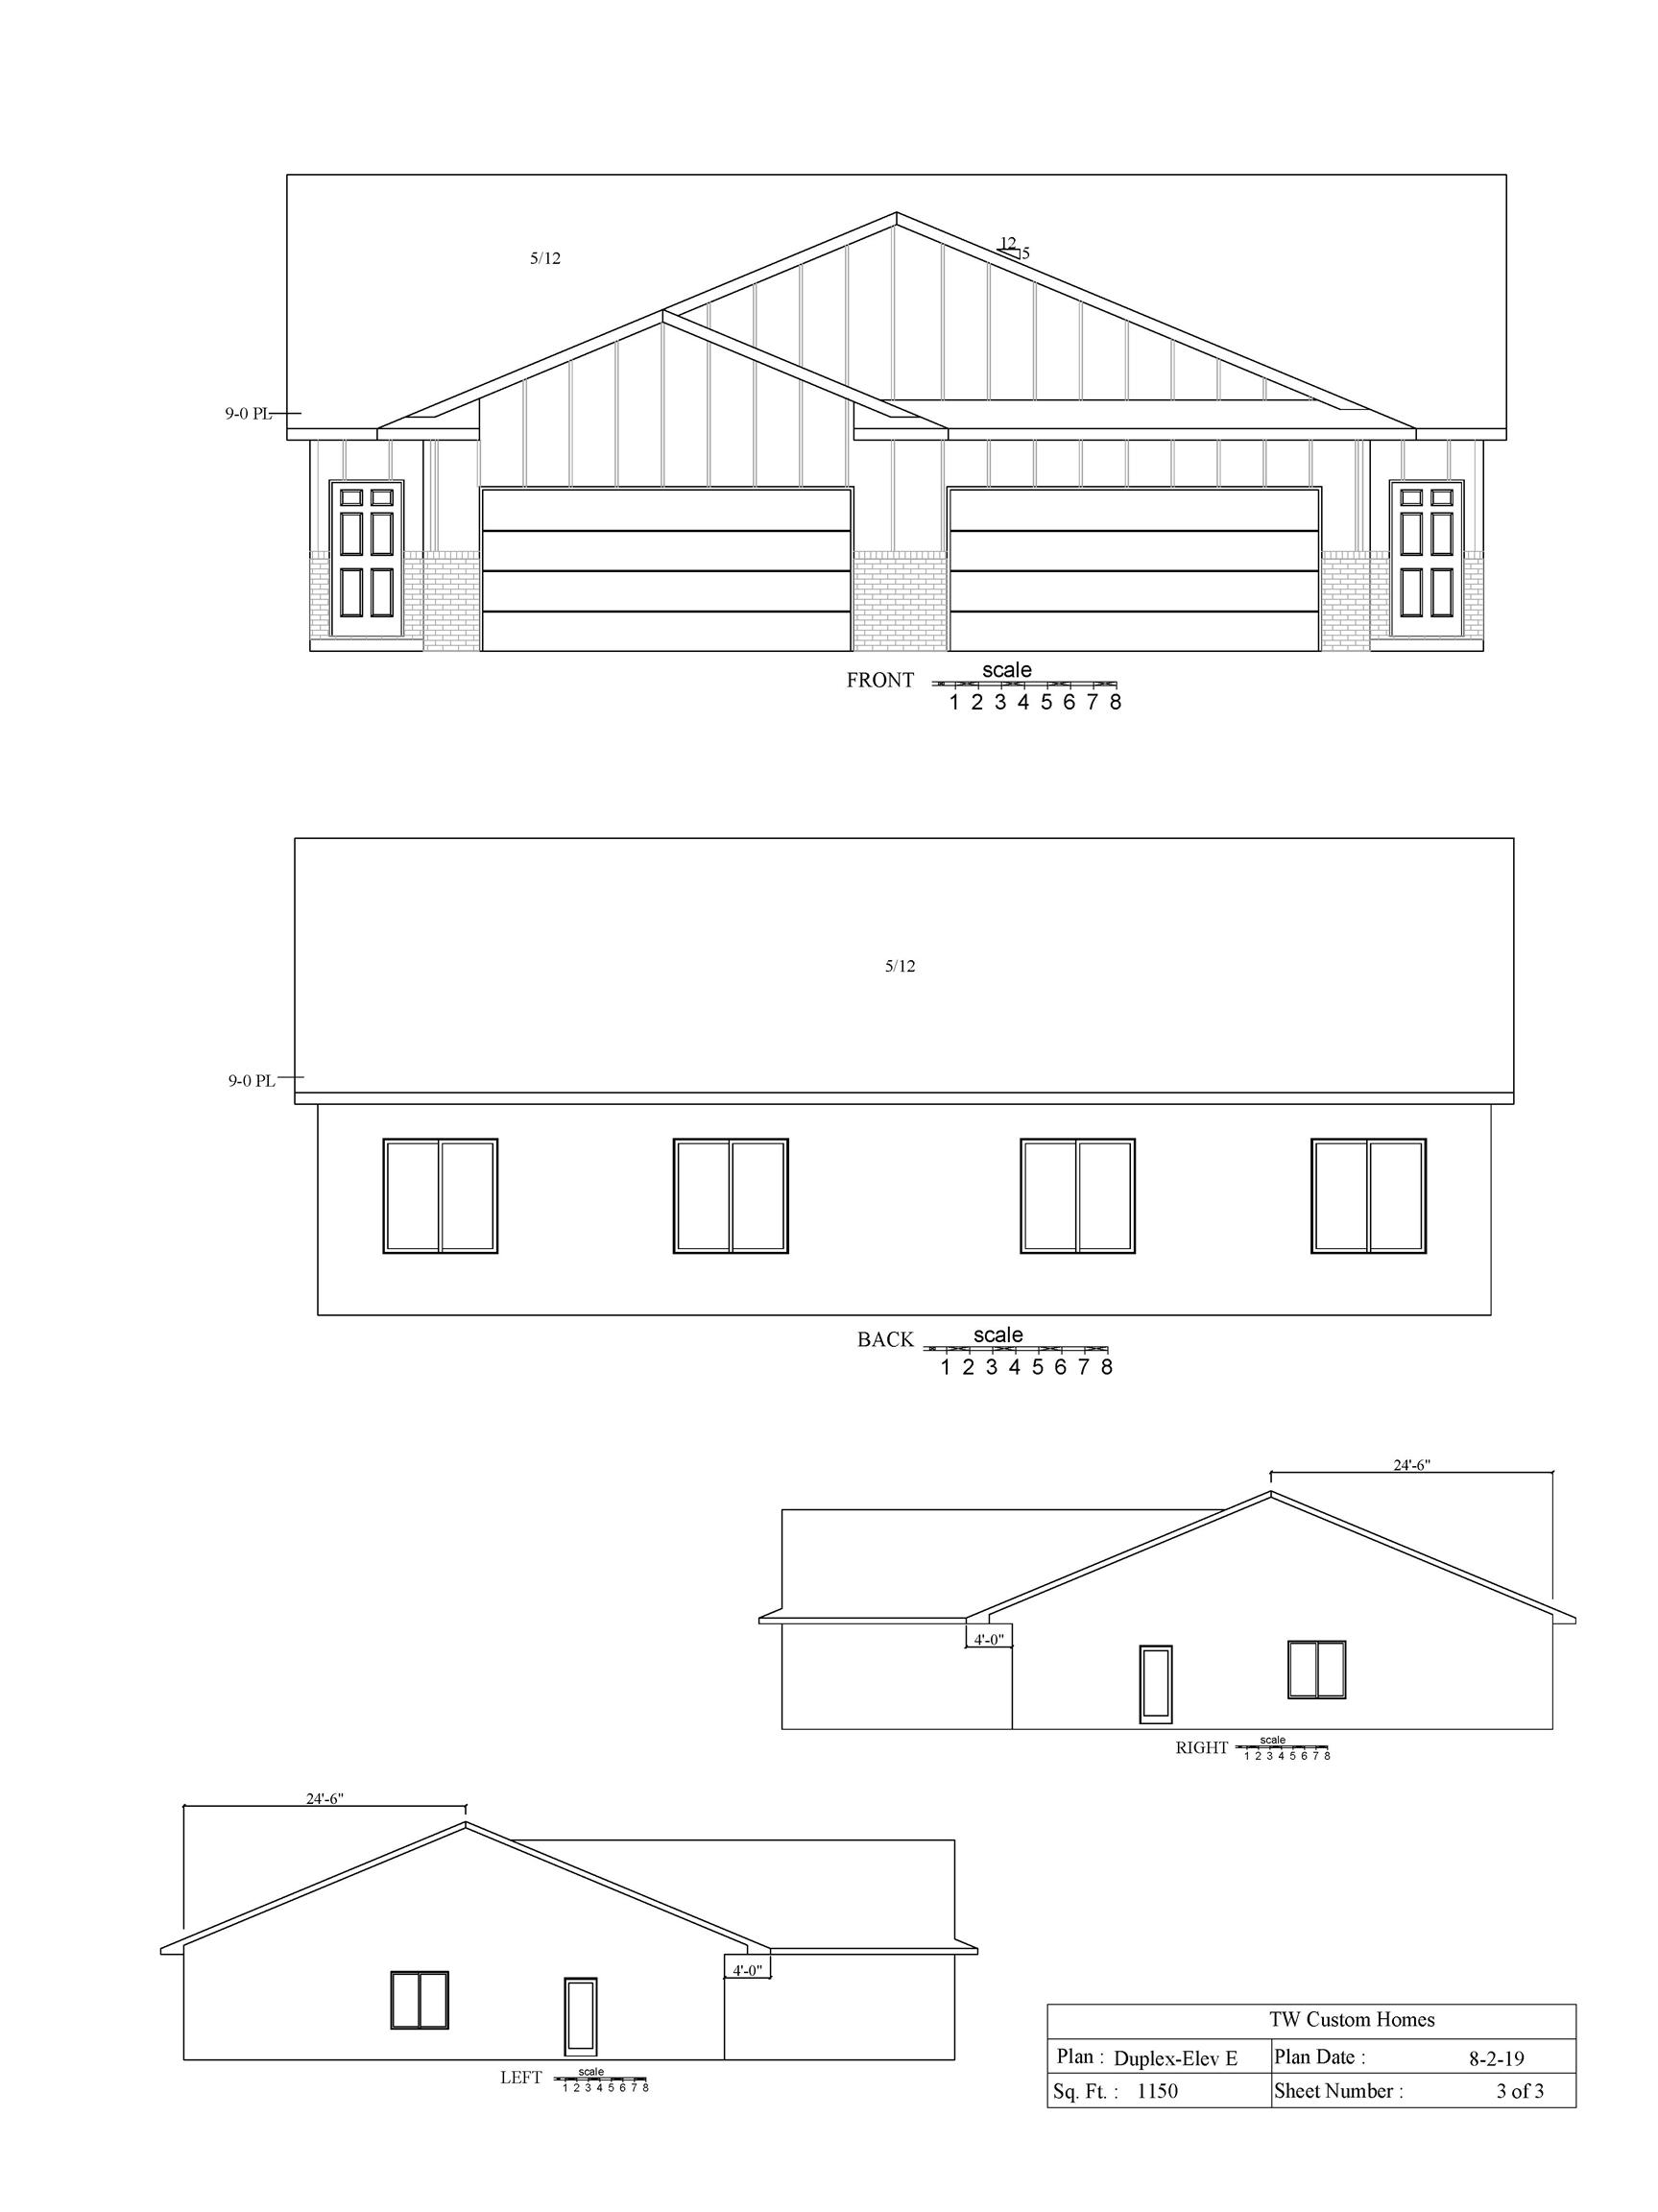 676-680 E Martens, Goddard, KS, 67052